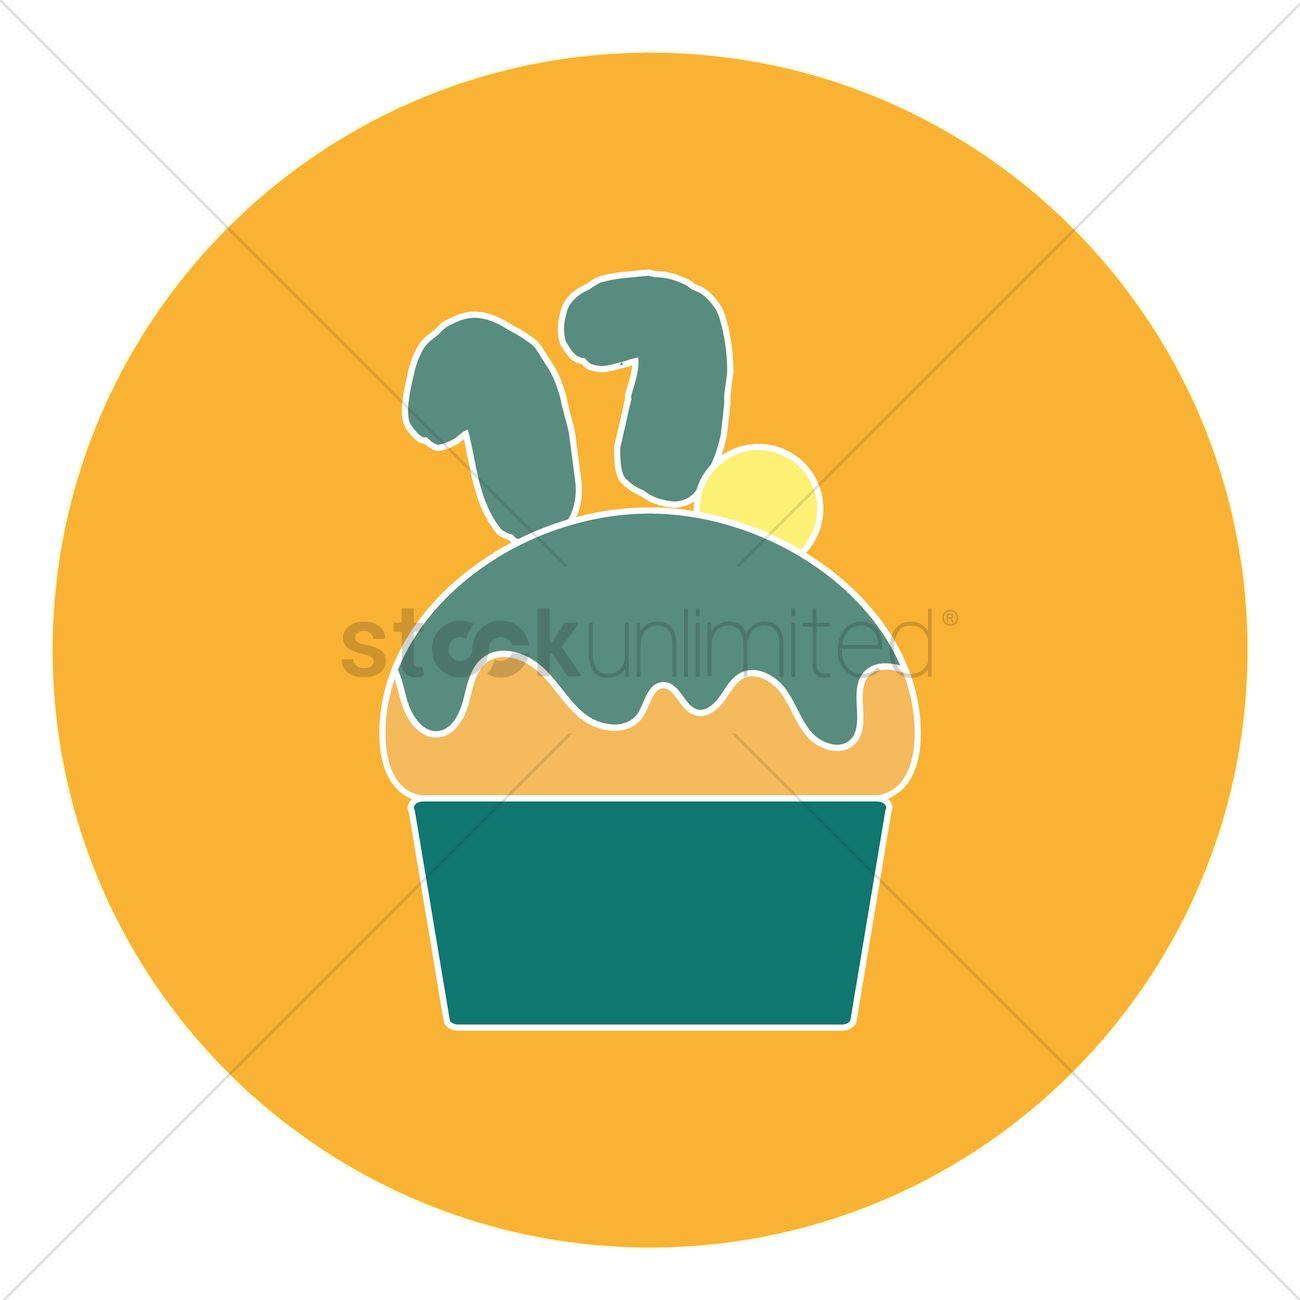 Free 17th birthday cupcake Vector Image.